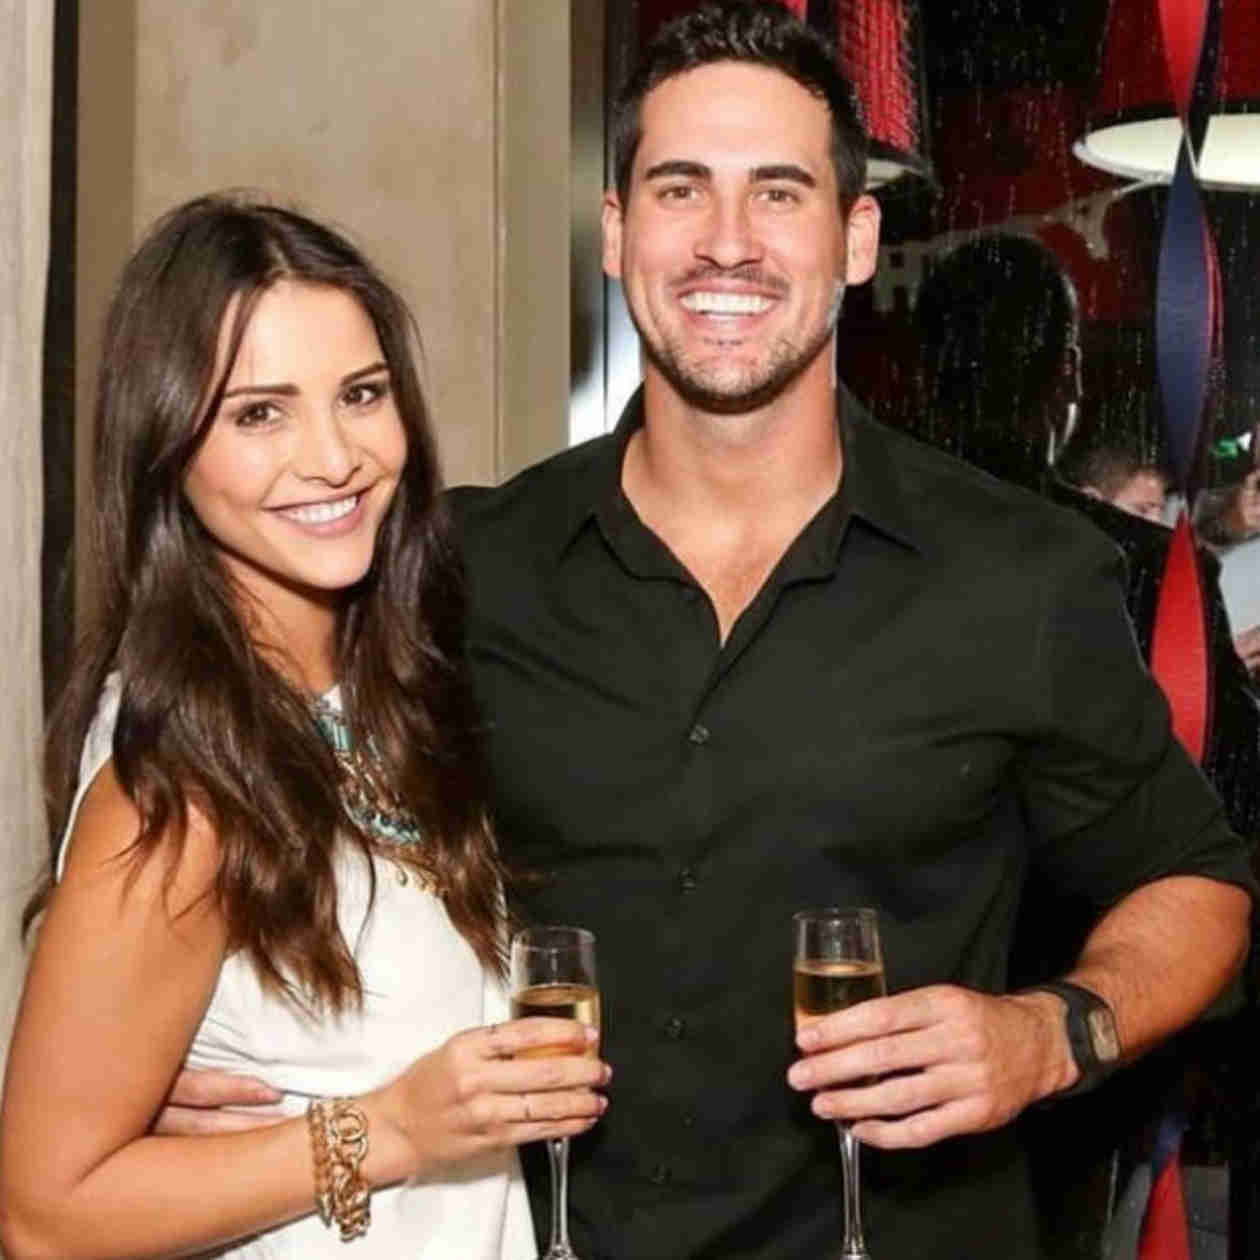 Bachelorette 2014: Are Andi Dorfman and Josh Murray Moving to LA?